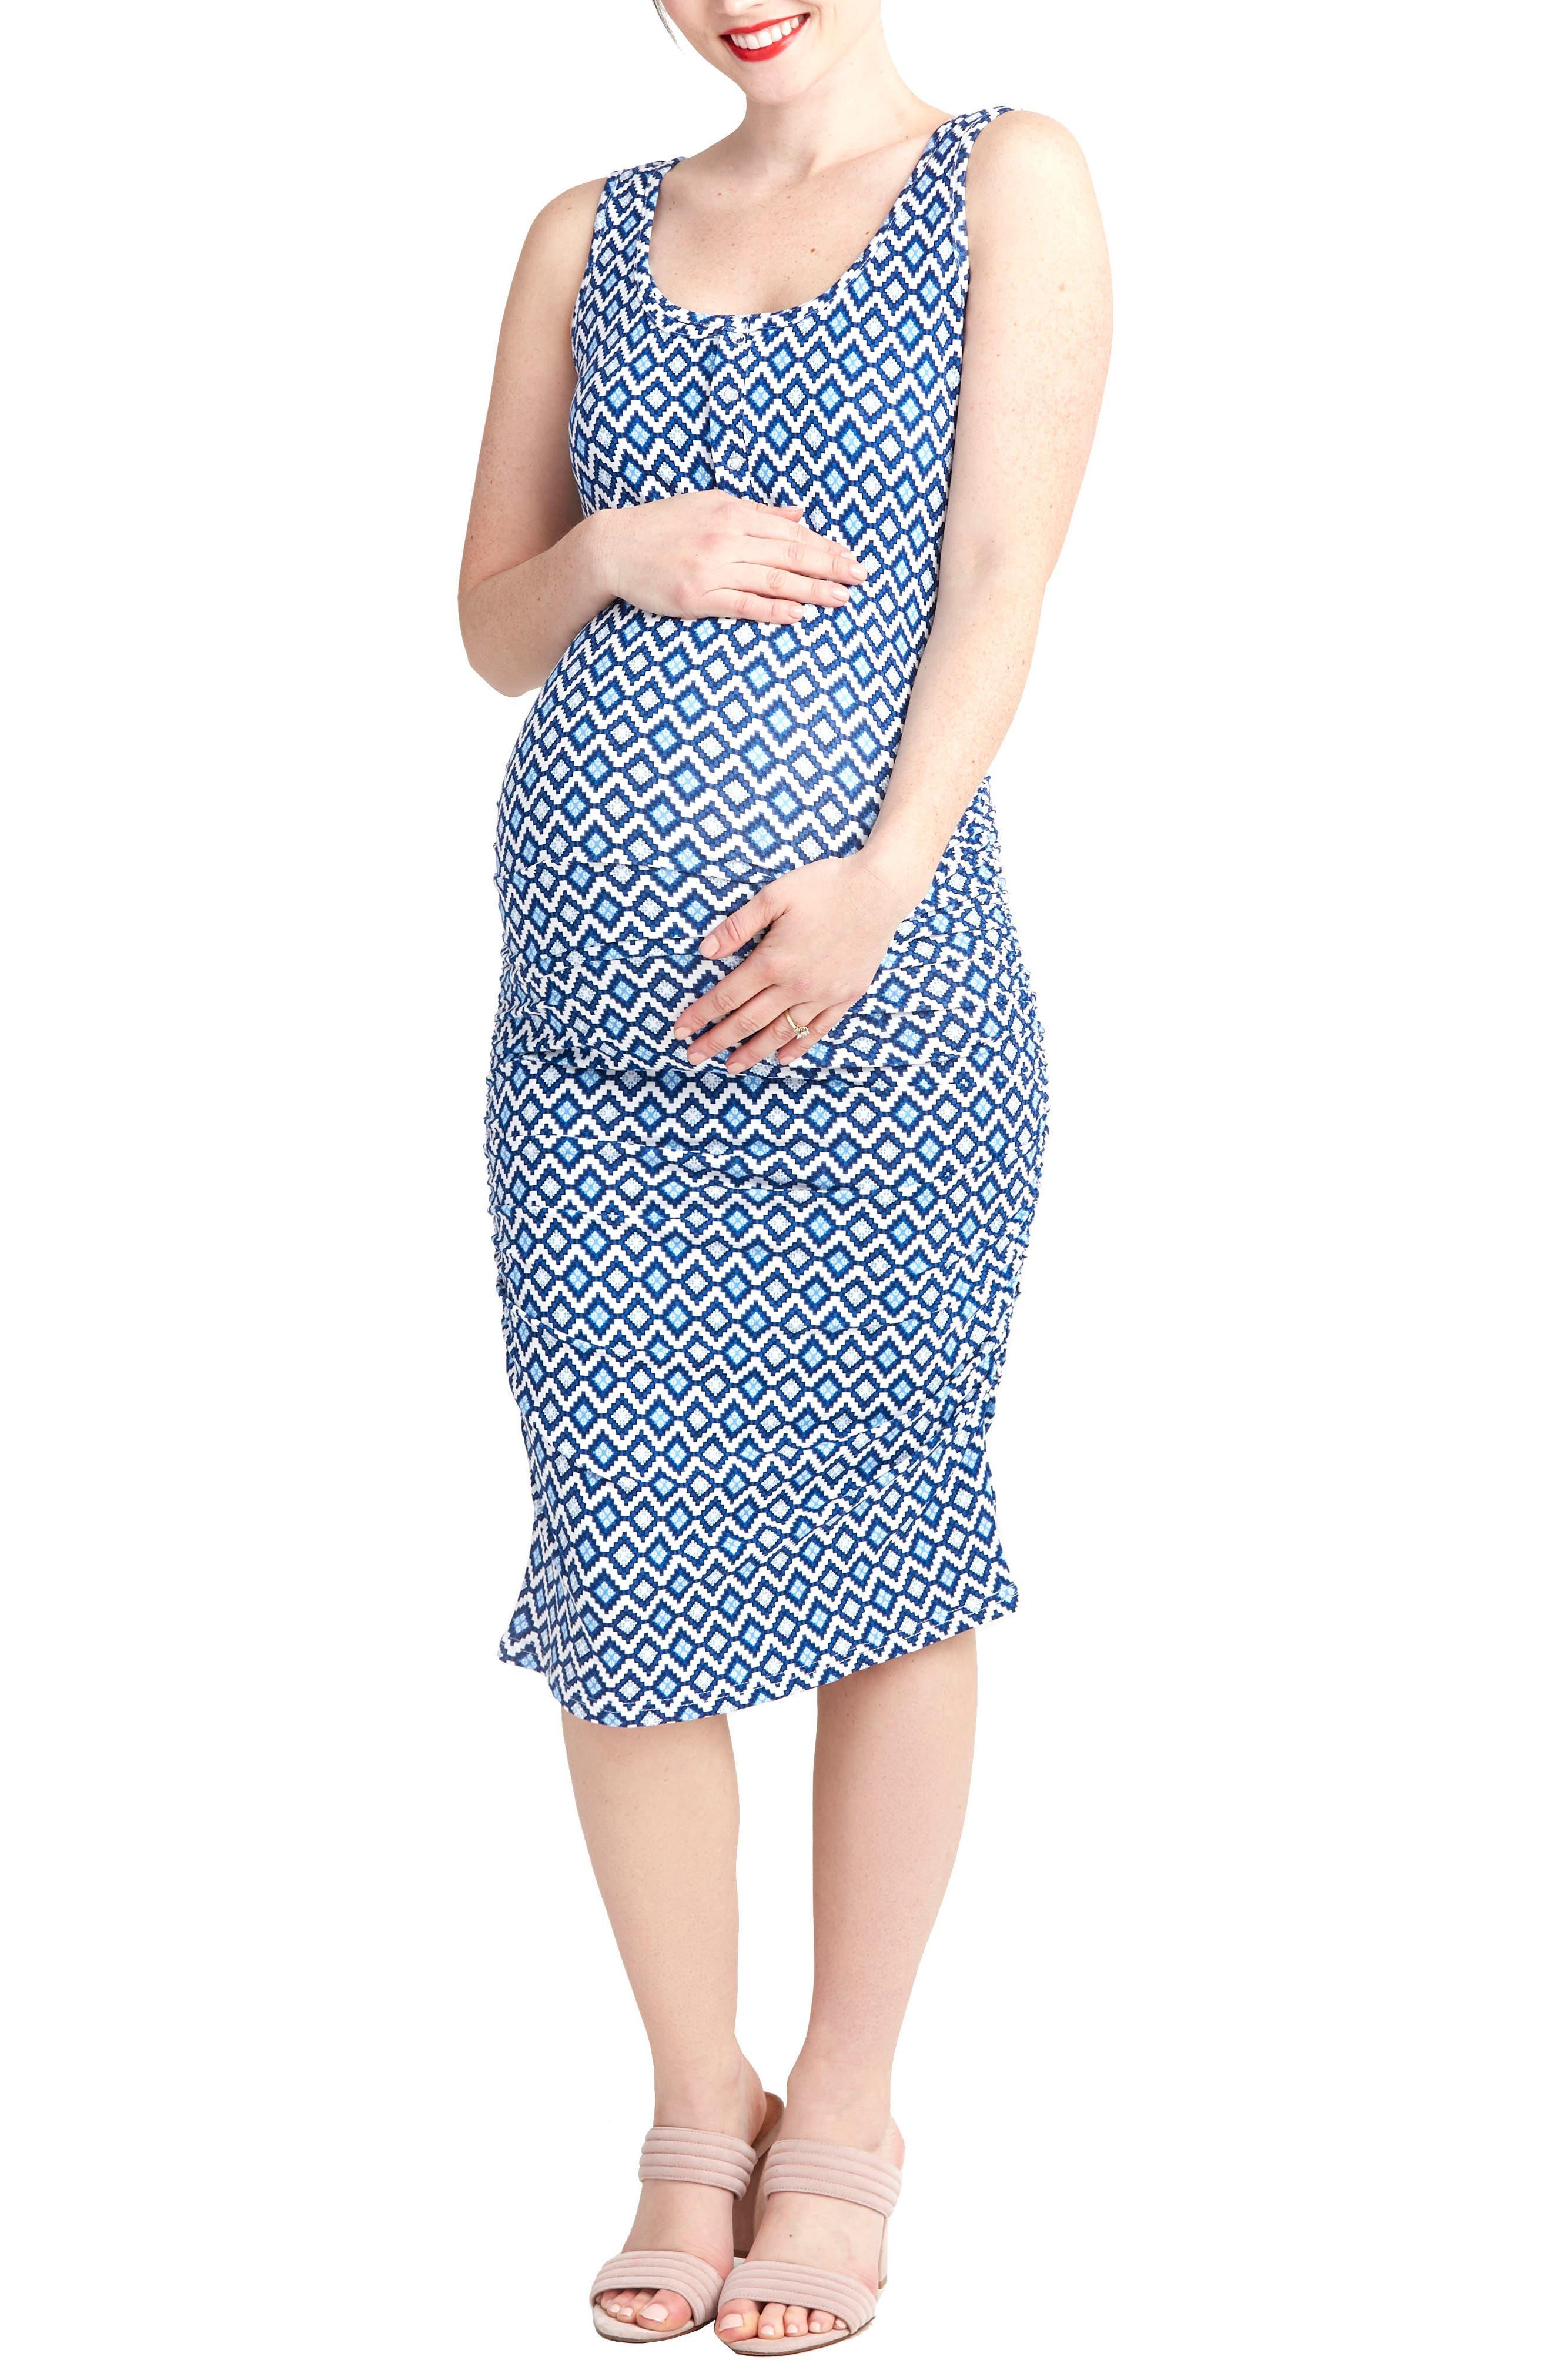 Maternity Women's Clothing Nordstrom Nom Maternity Nursing Black Snap Knit Midi Dress Size Large 10 12